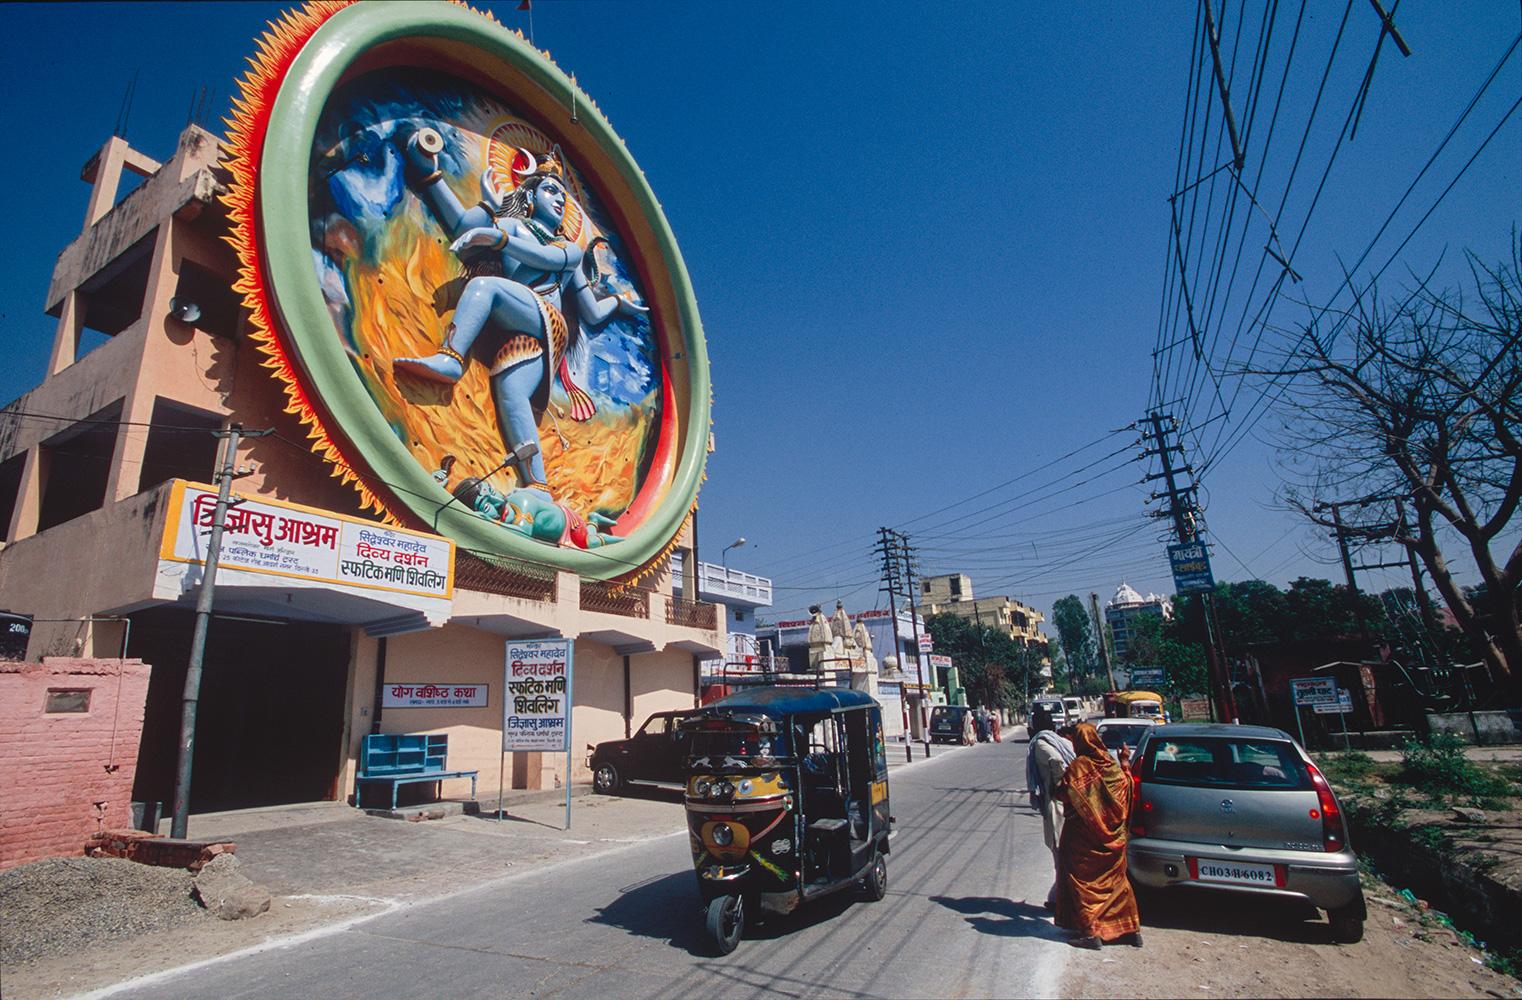 ashram_front_haridwar_2004RVP